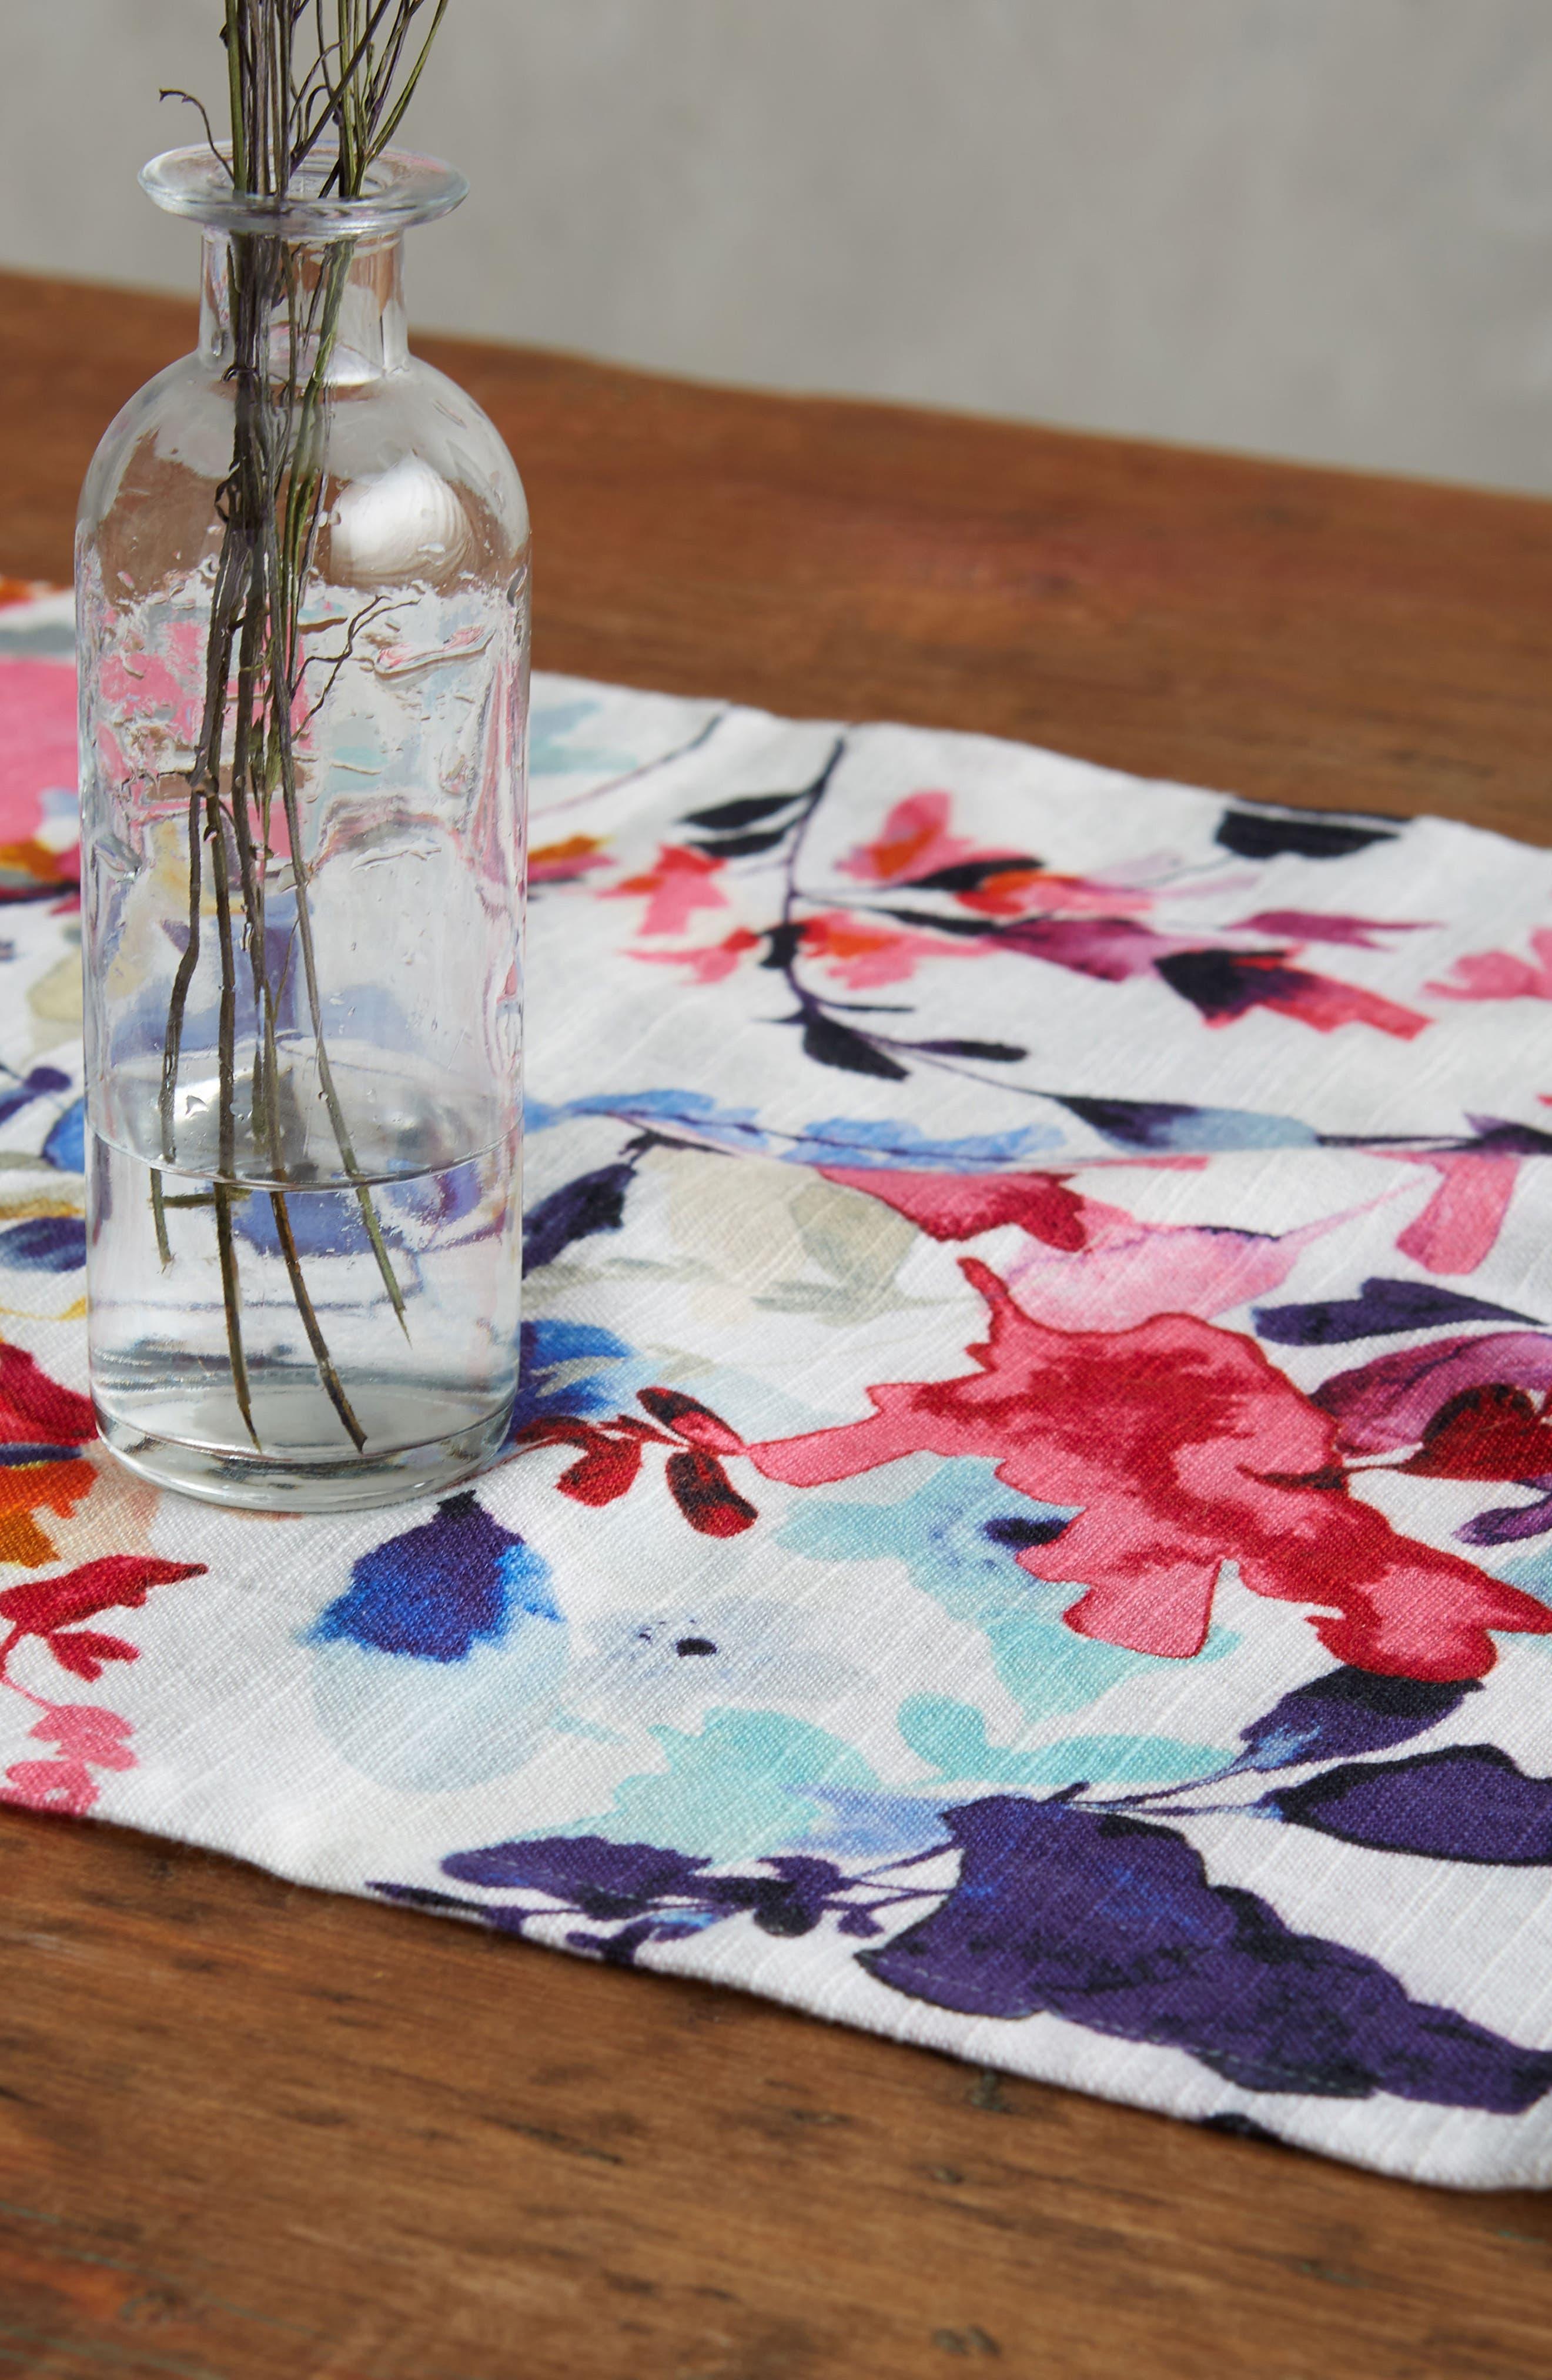 Wildflower Study Table Runner,                             Alternate thumbnail 2, color,                             650